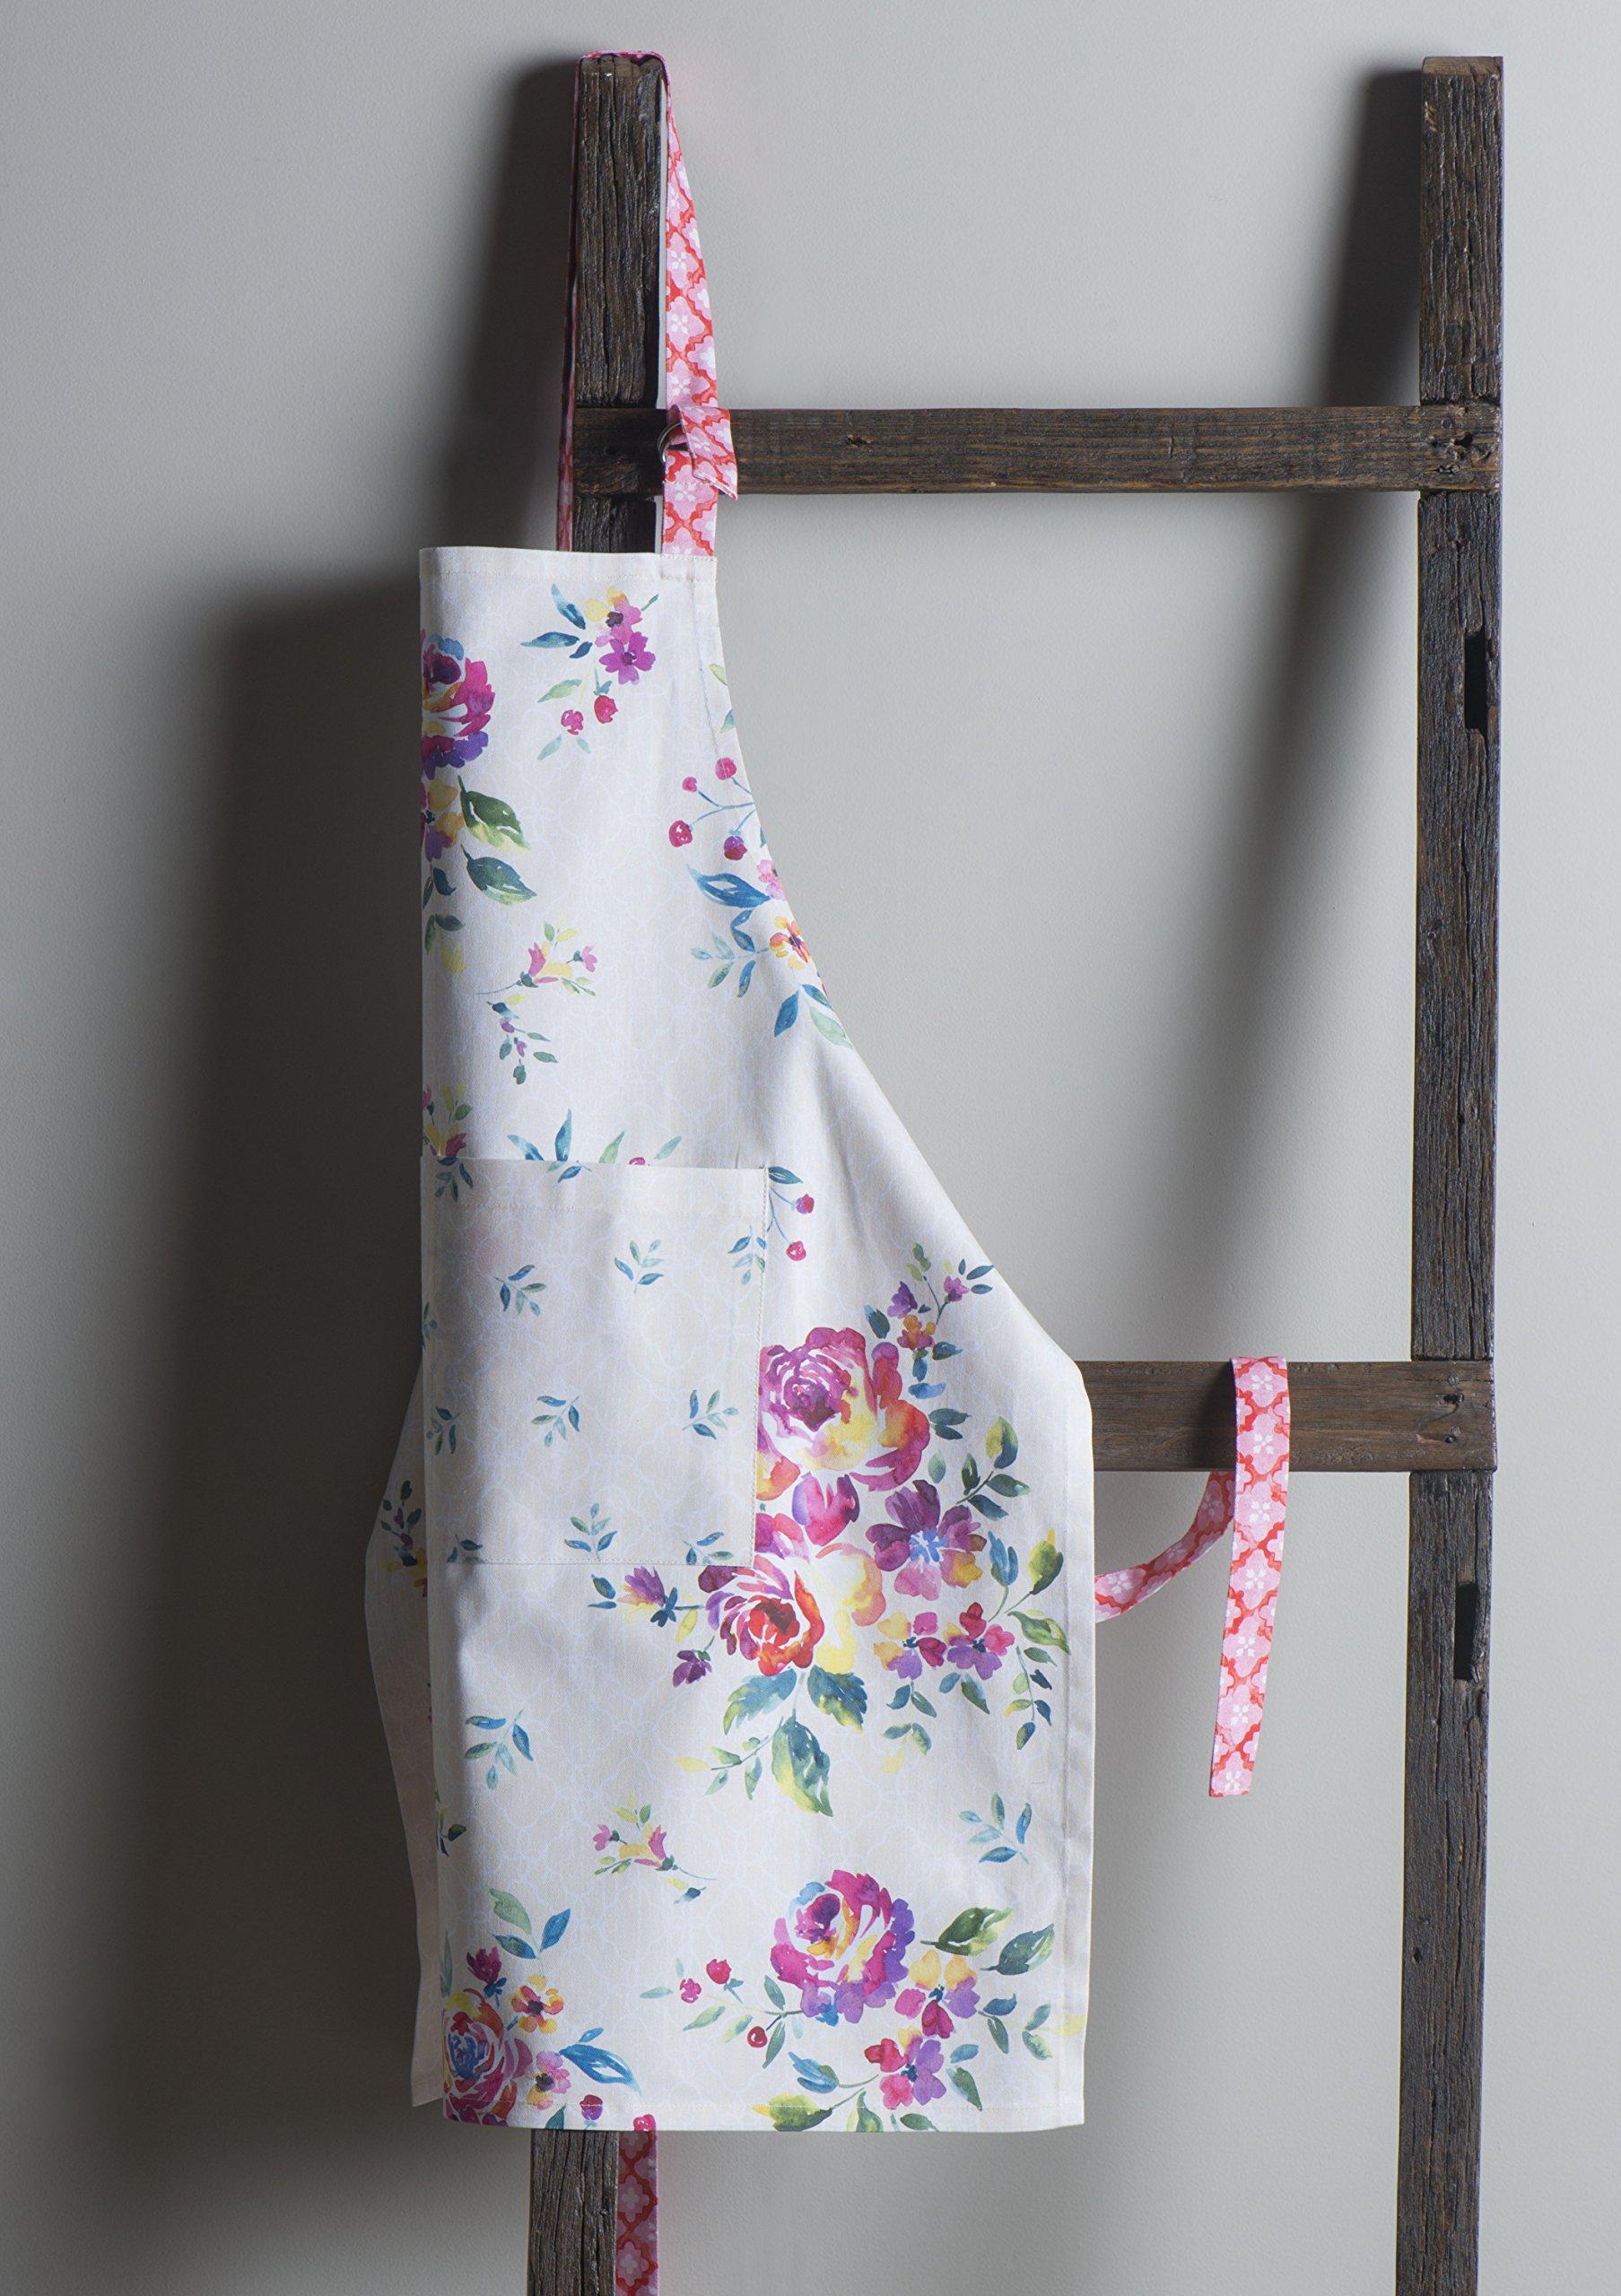 Maison d' Hermine Rose Garden 100% Cotton Apron with an adjustable neck & Visible center pocket 27.50 Inch by 31.50 Inch by Maison d' Hermine (Image #7)